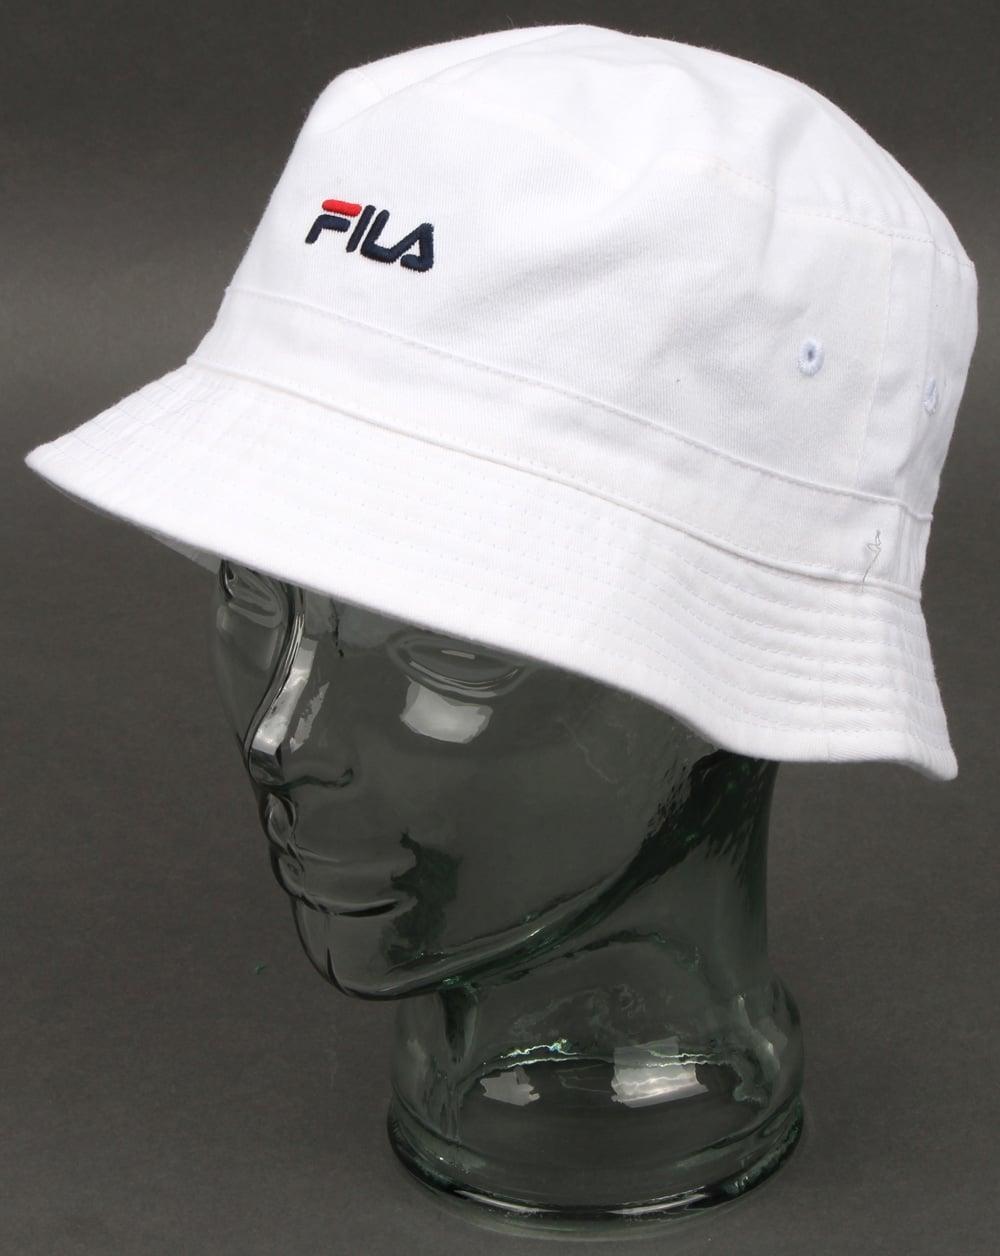 50075db8d63 Fila Vintage Fila Vintage Baxter Bucket Hat White